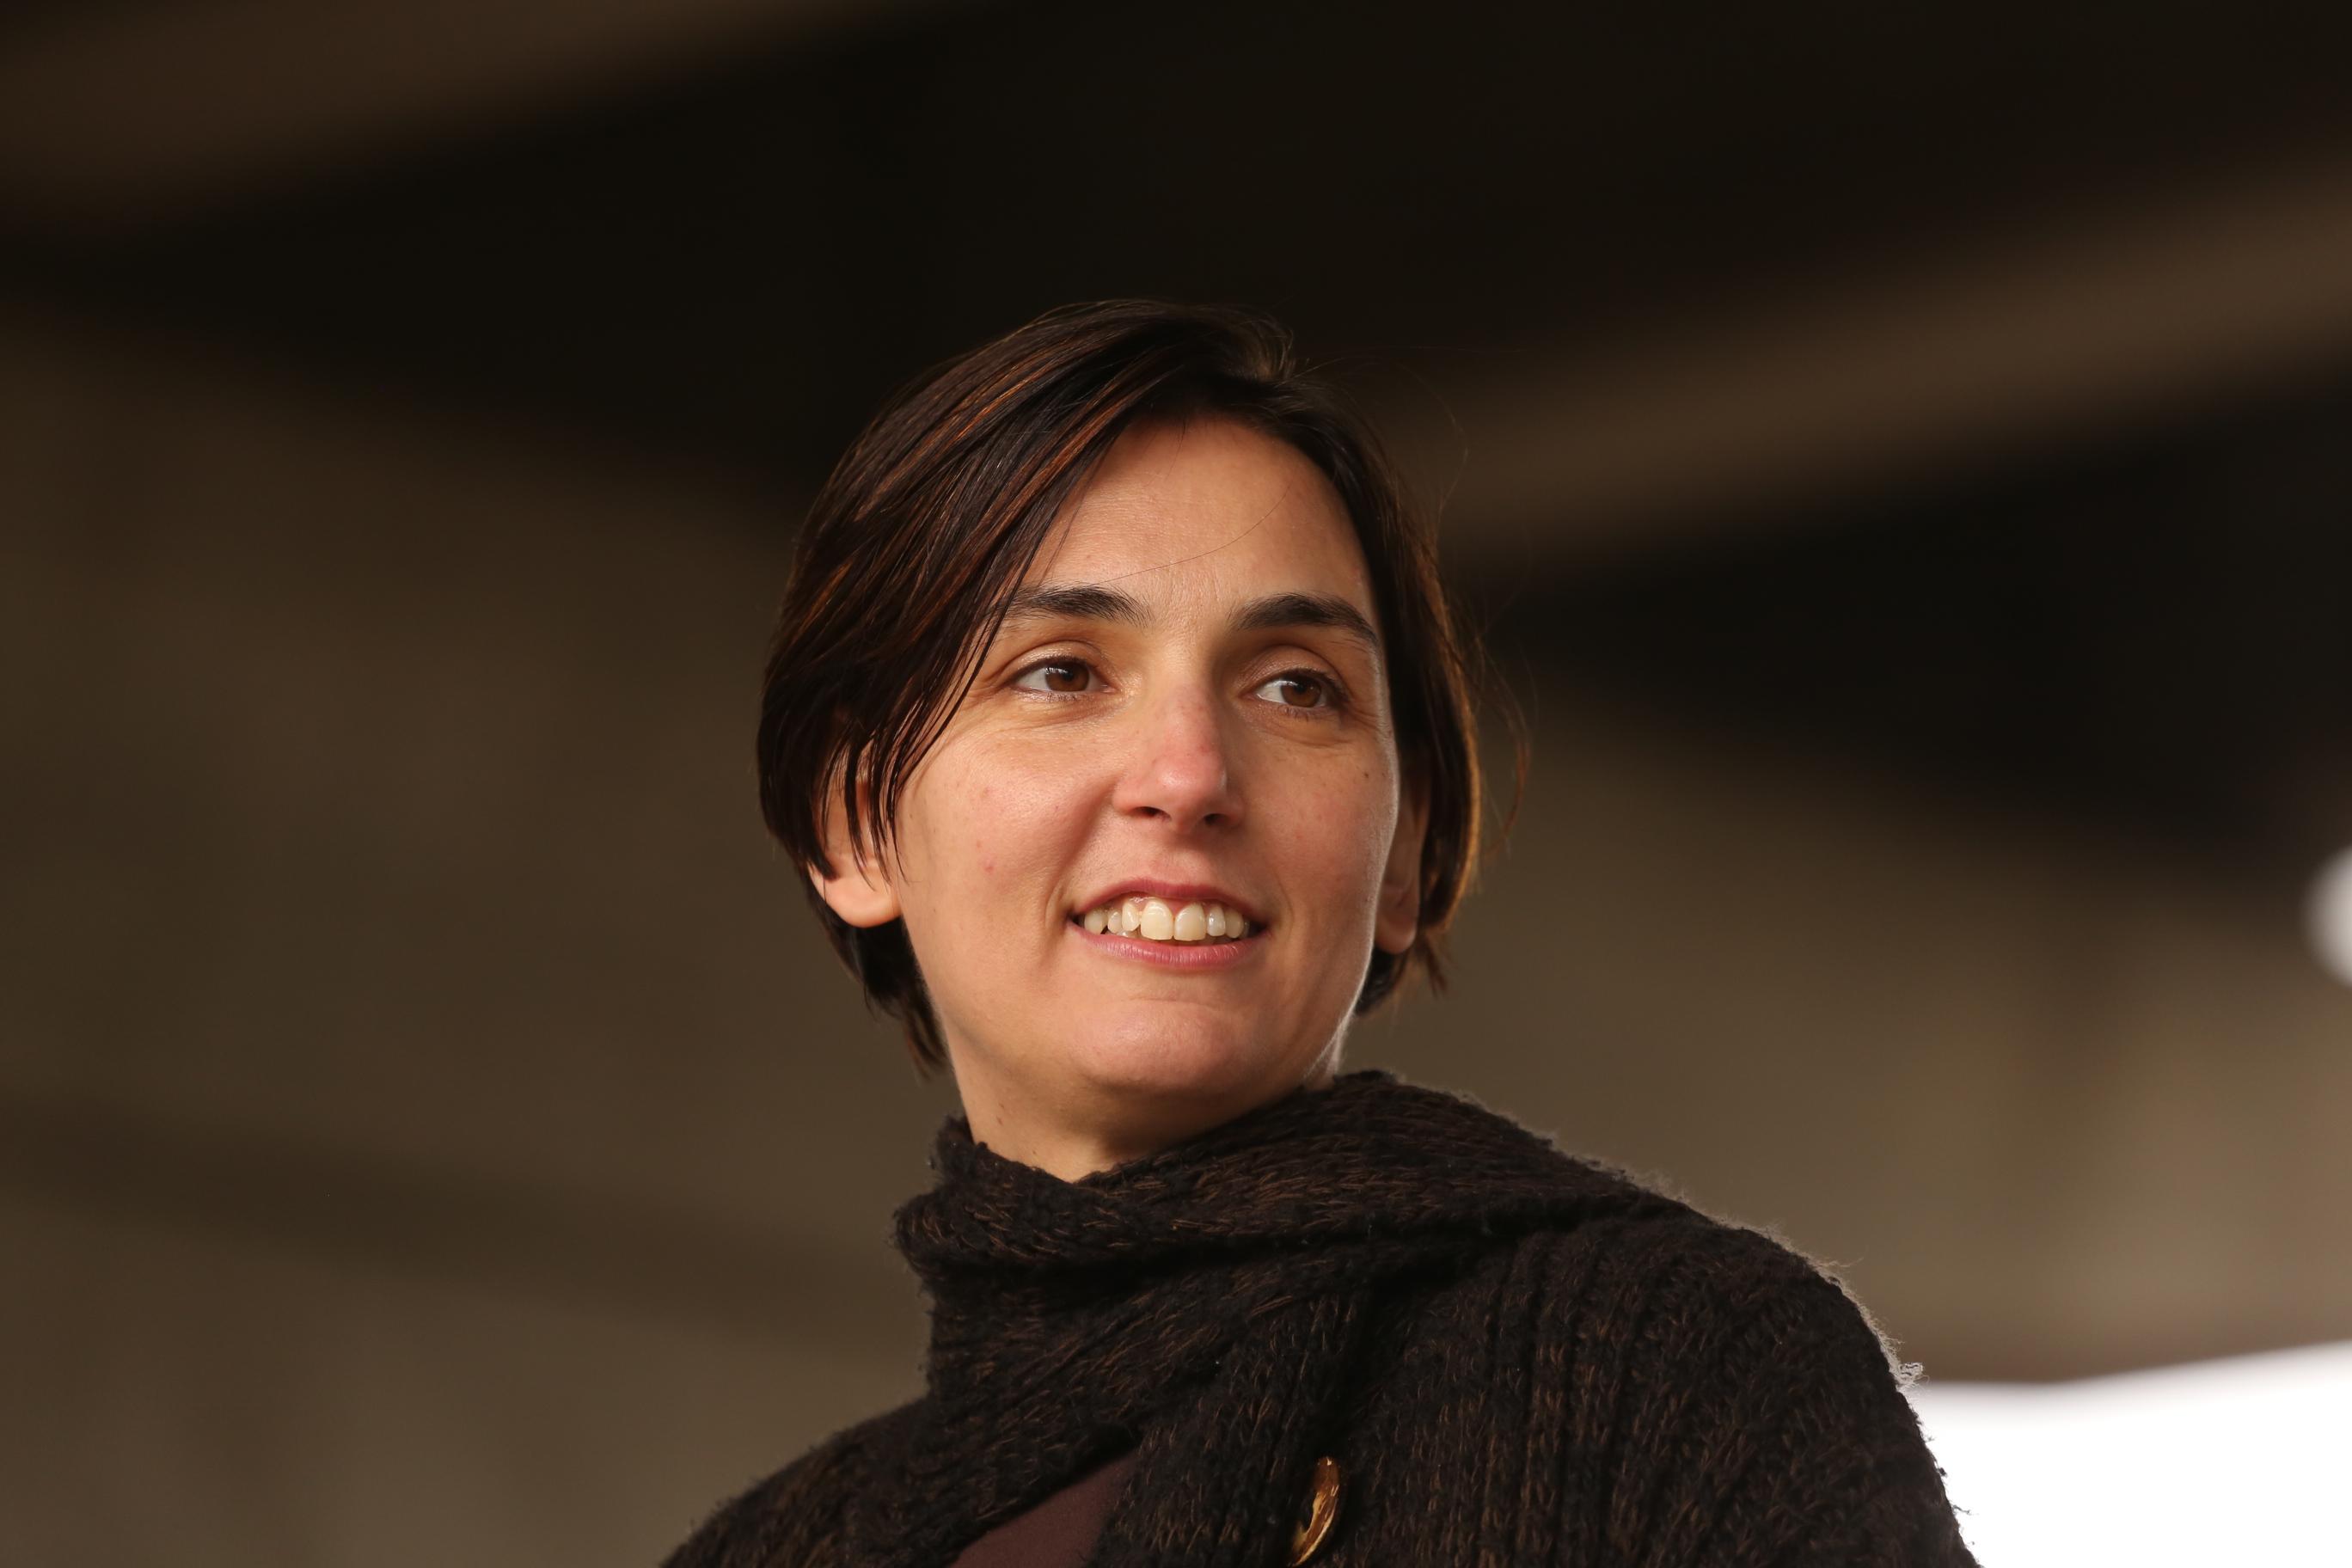 Prof. Ana-Sunčana Smith